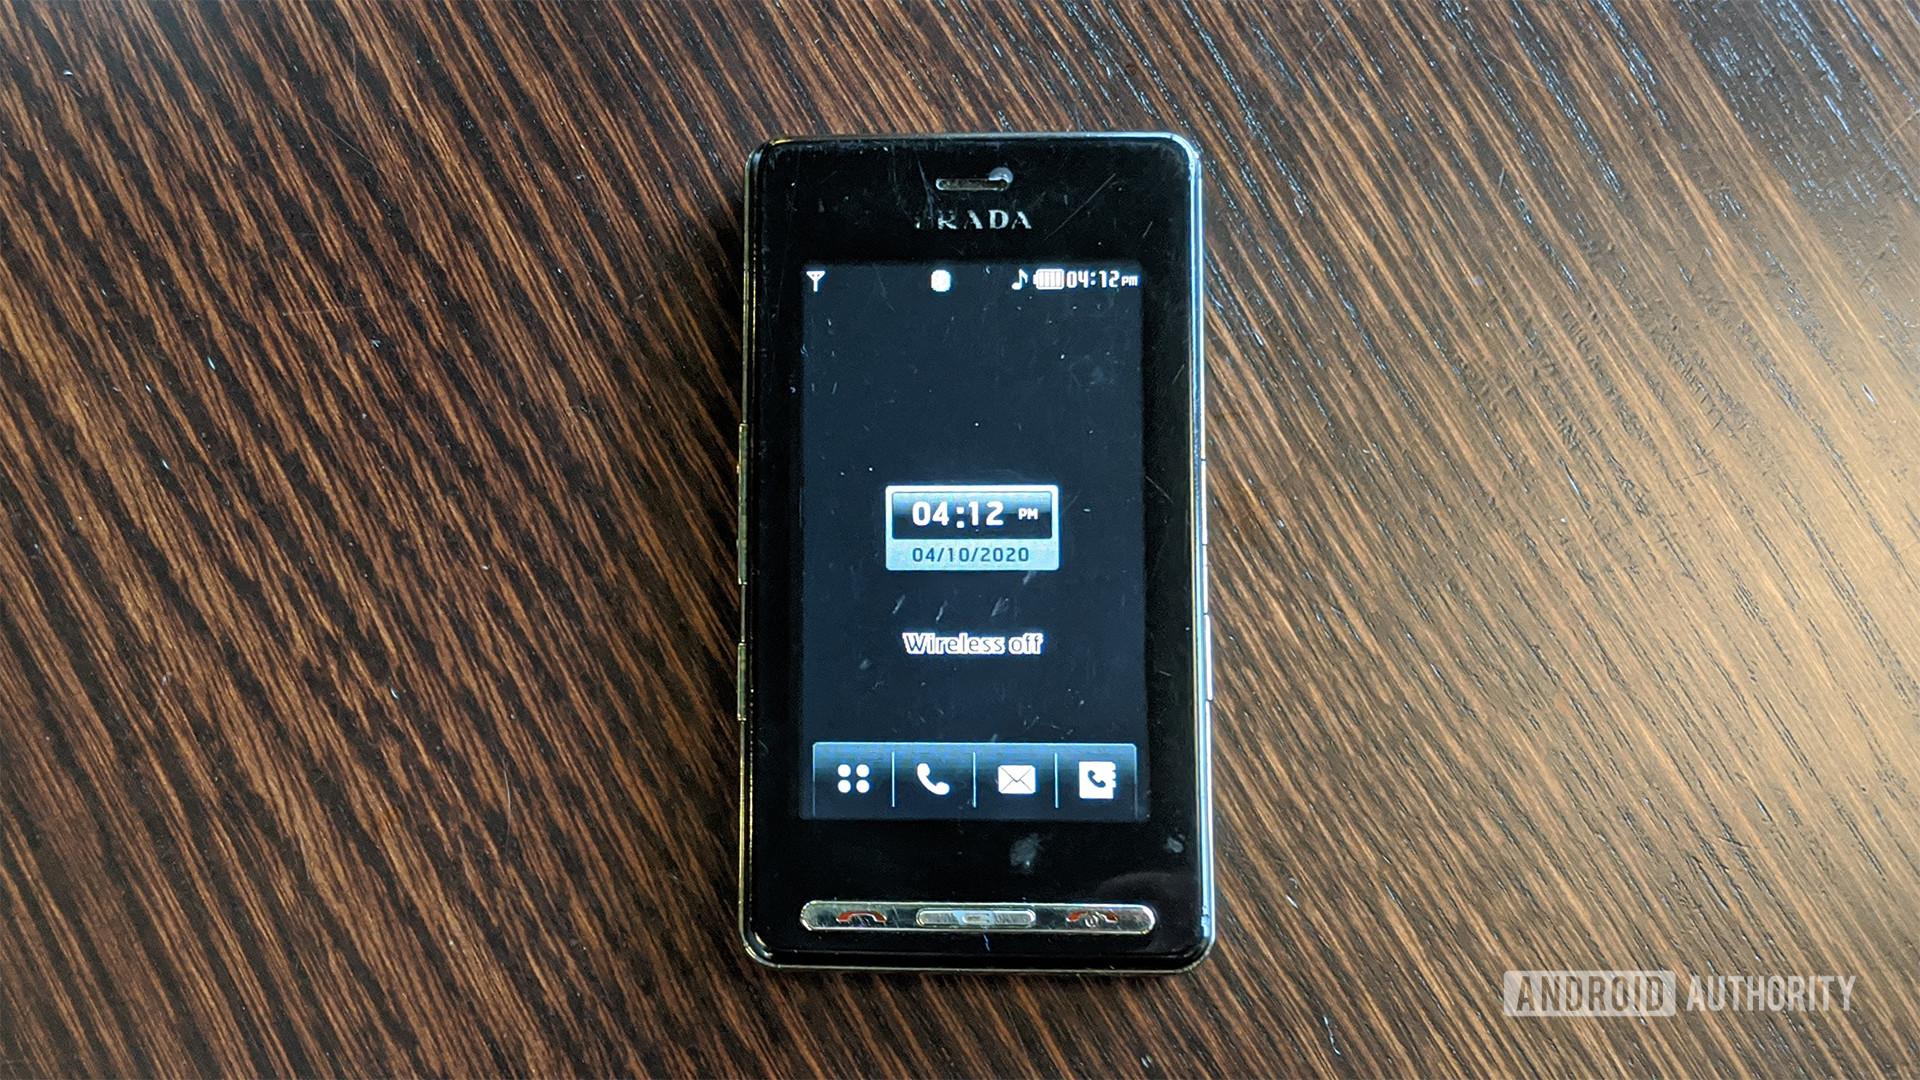 LG Prada KE850 Front On Table